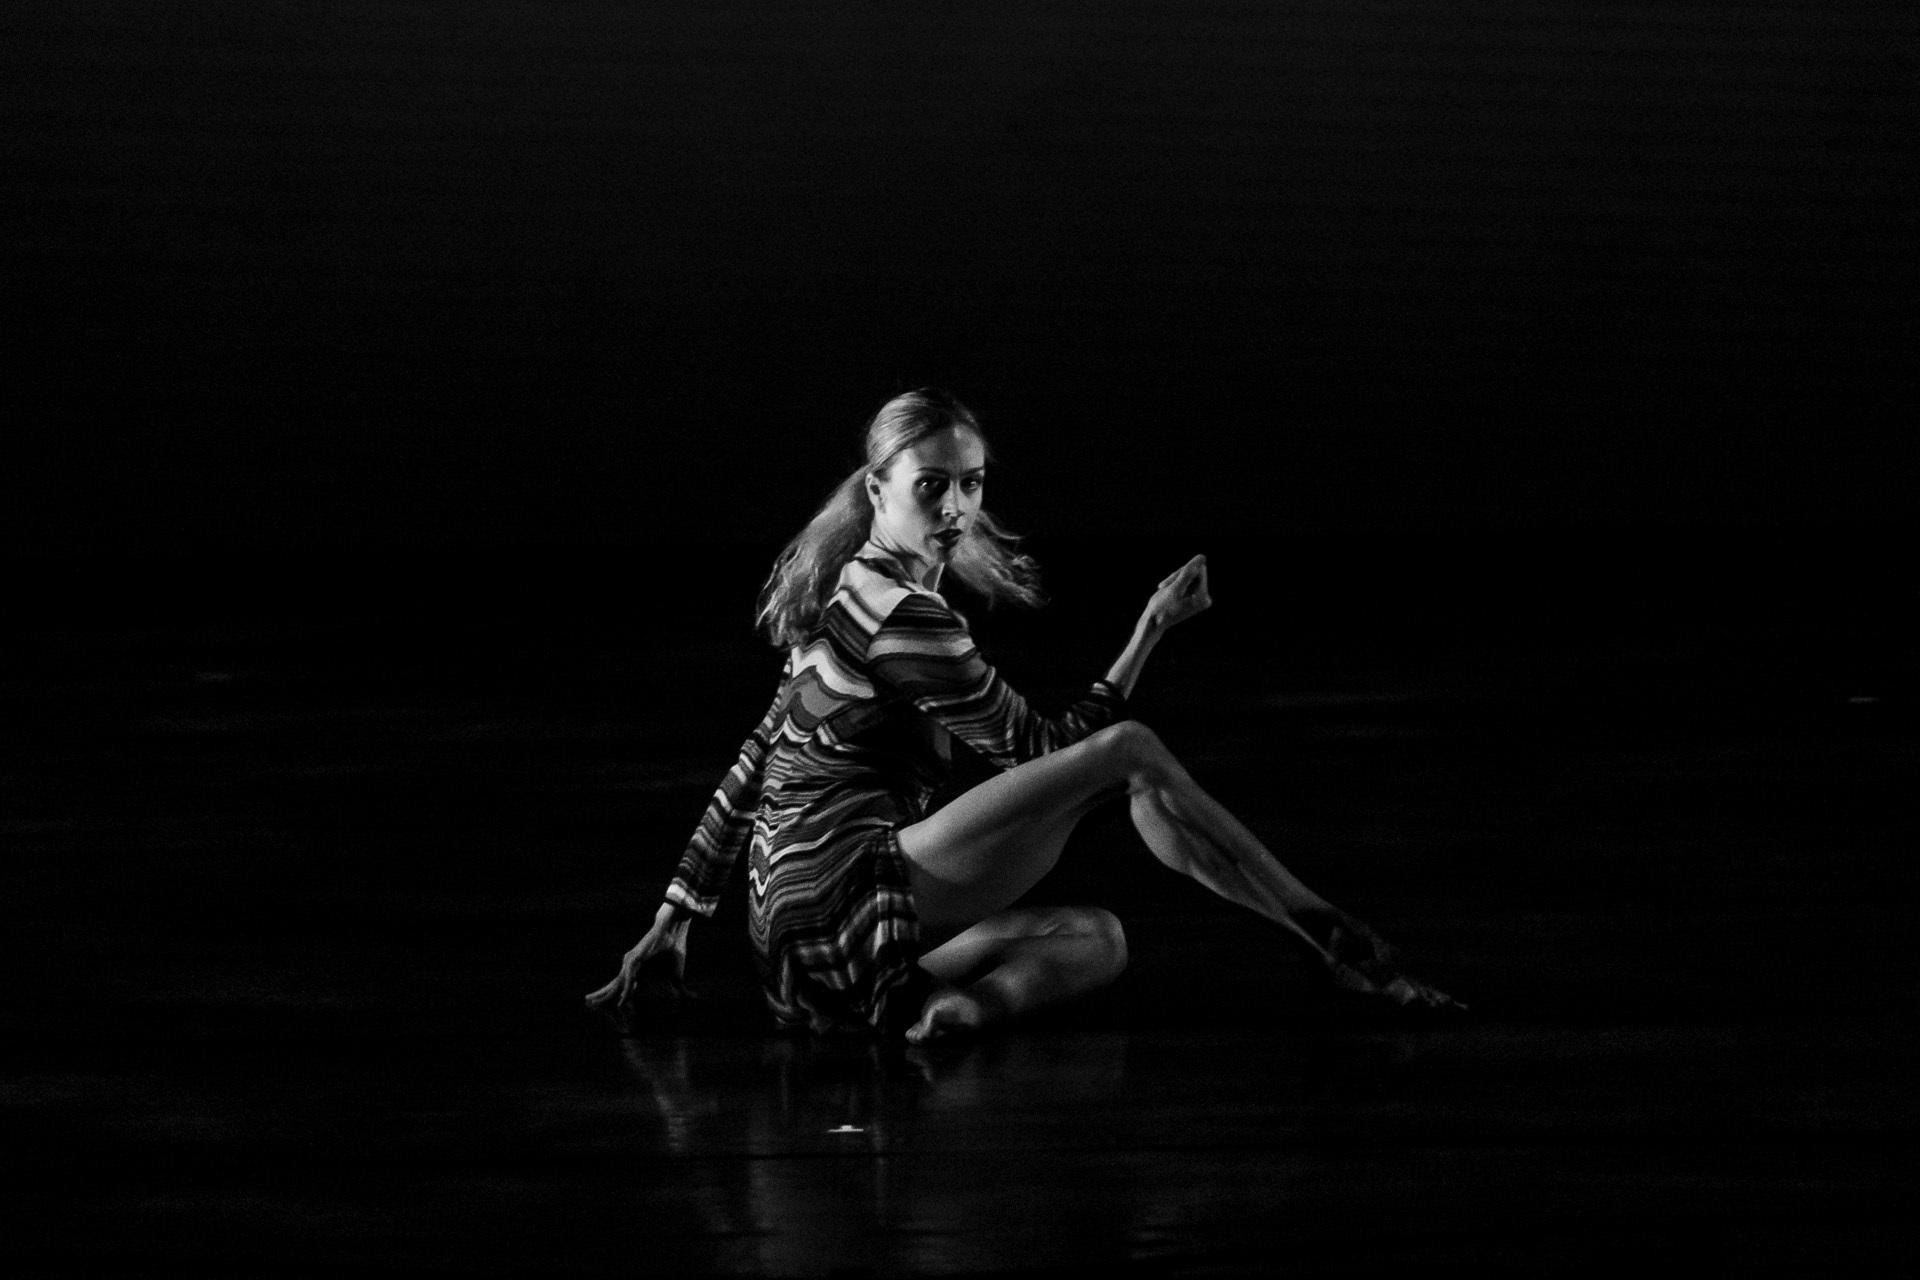 2019_03_01-Parsons-Dance-©-Luca-Vantusso-213315-EOSR1069